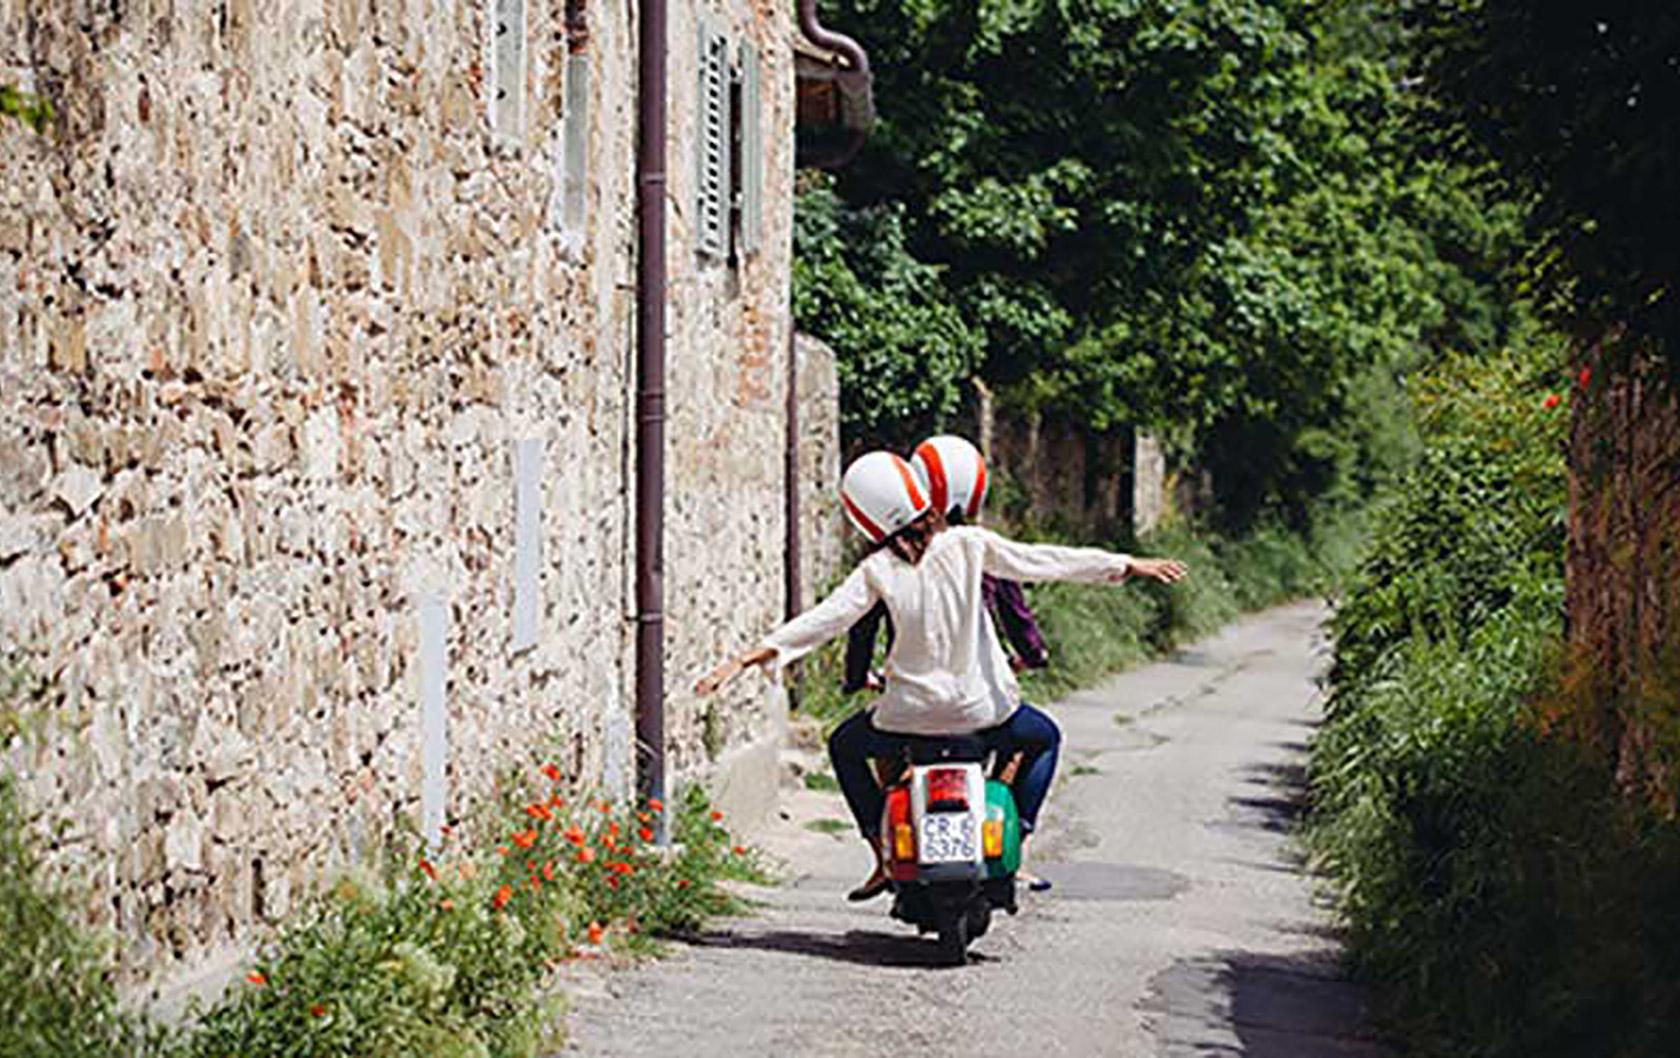 Taking a Vintage Vespa Tour of Tuscany